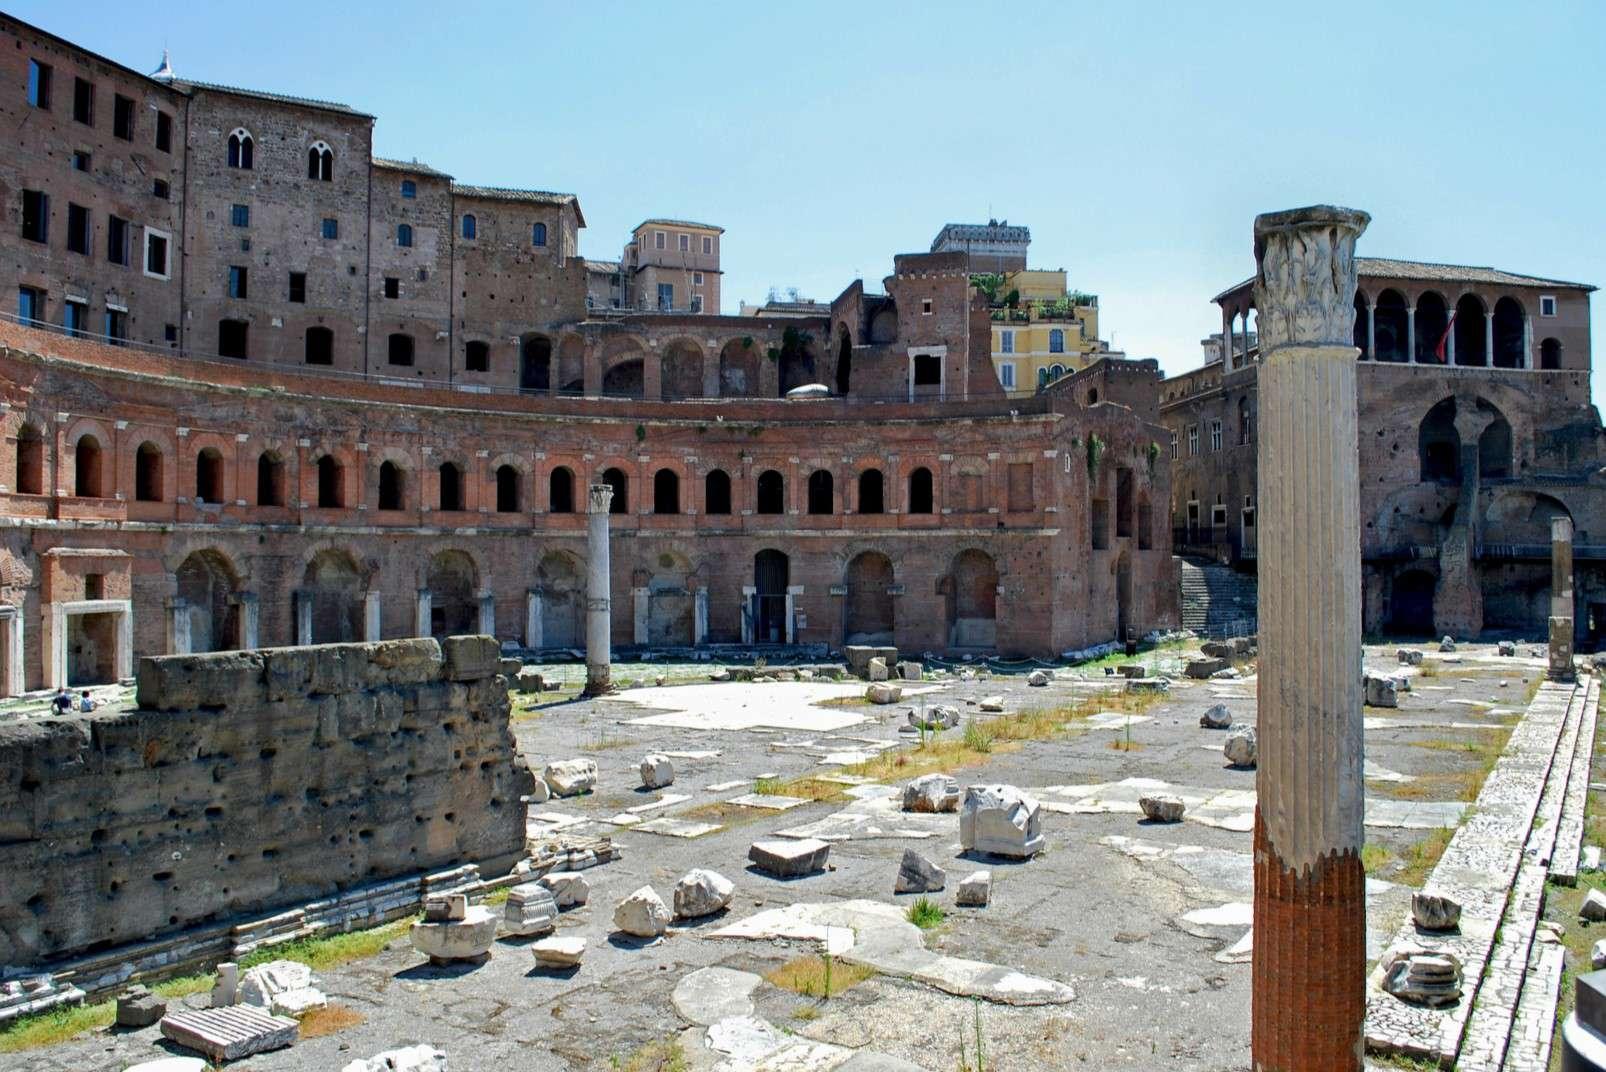 Mercati di Traiano, Roma